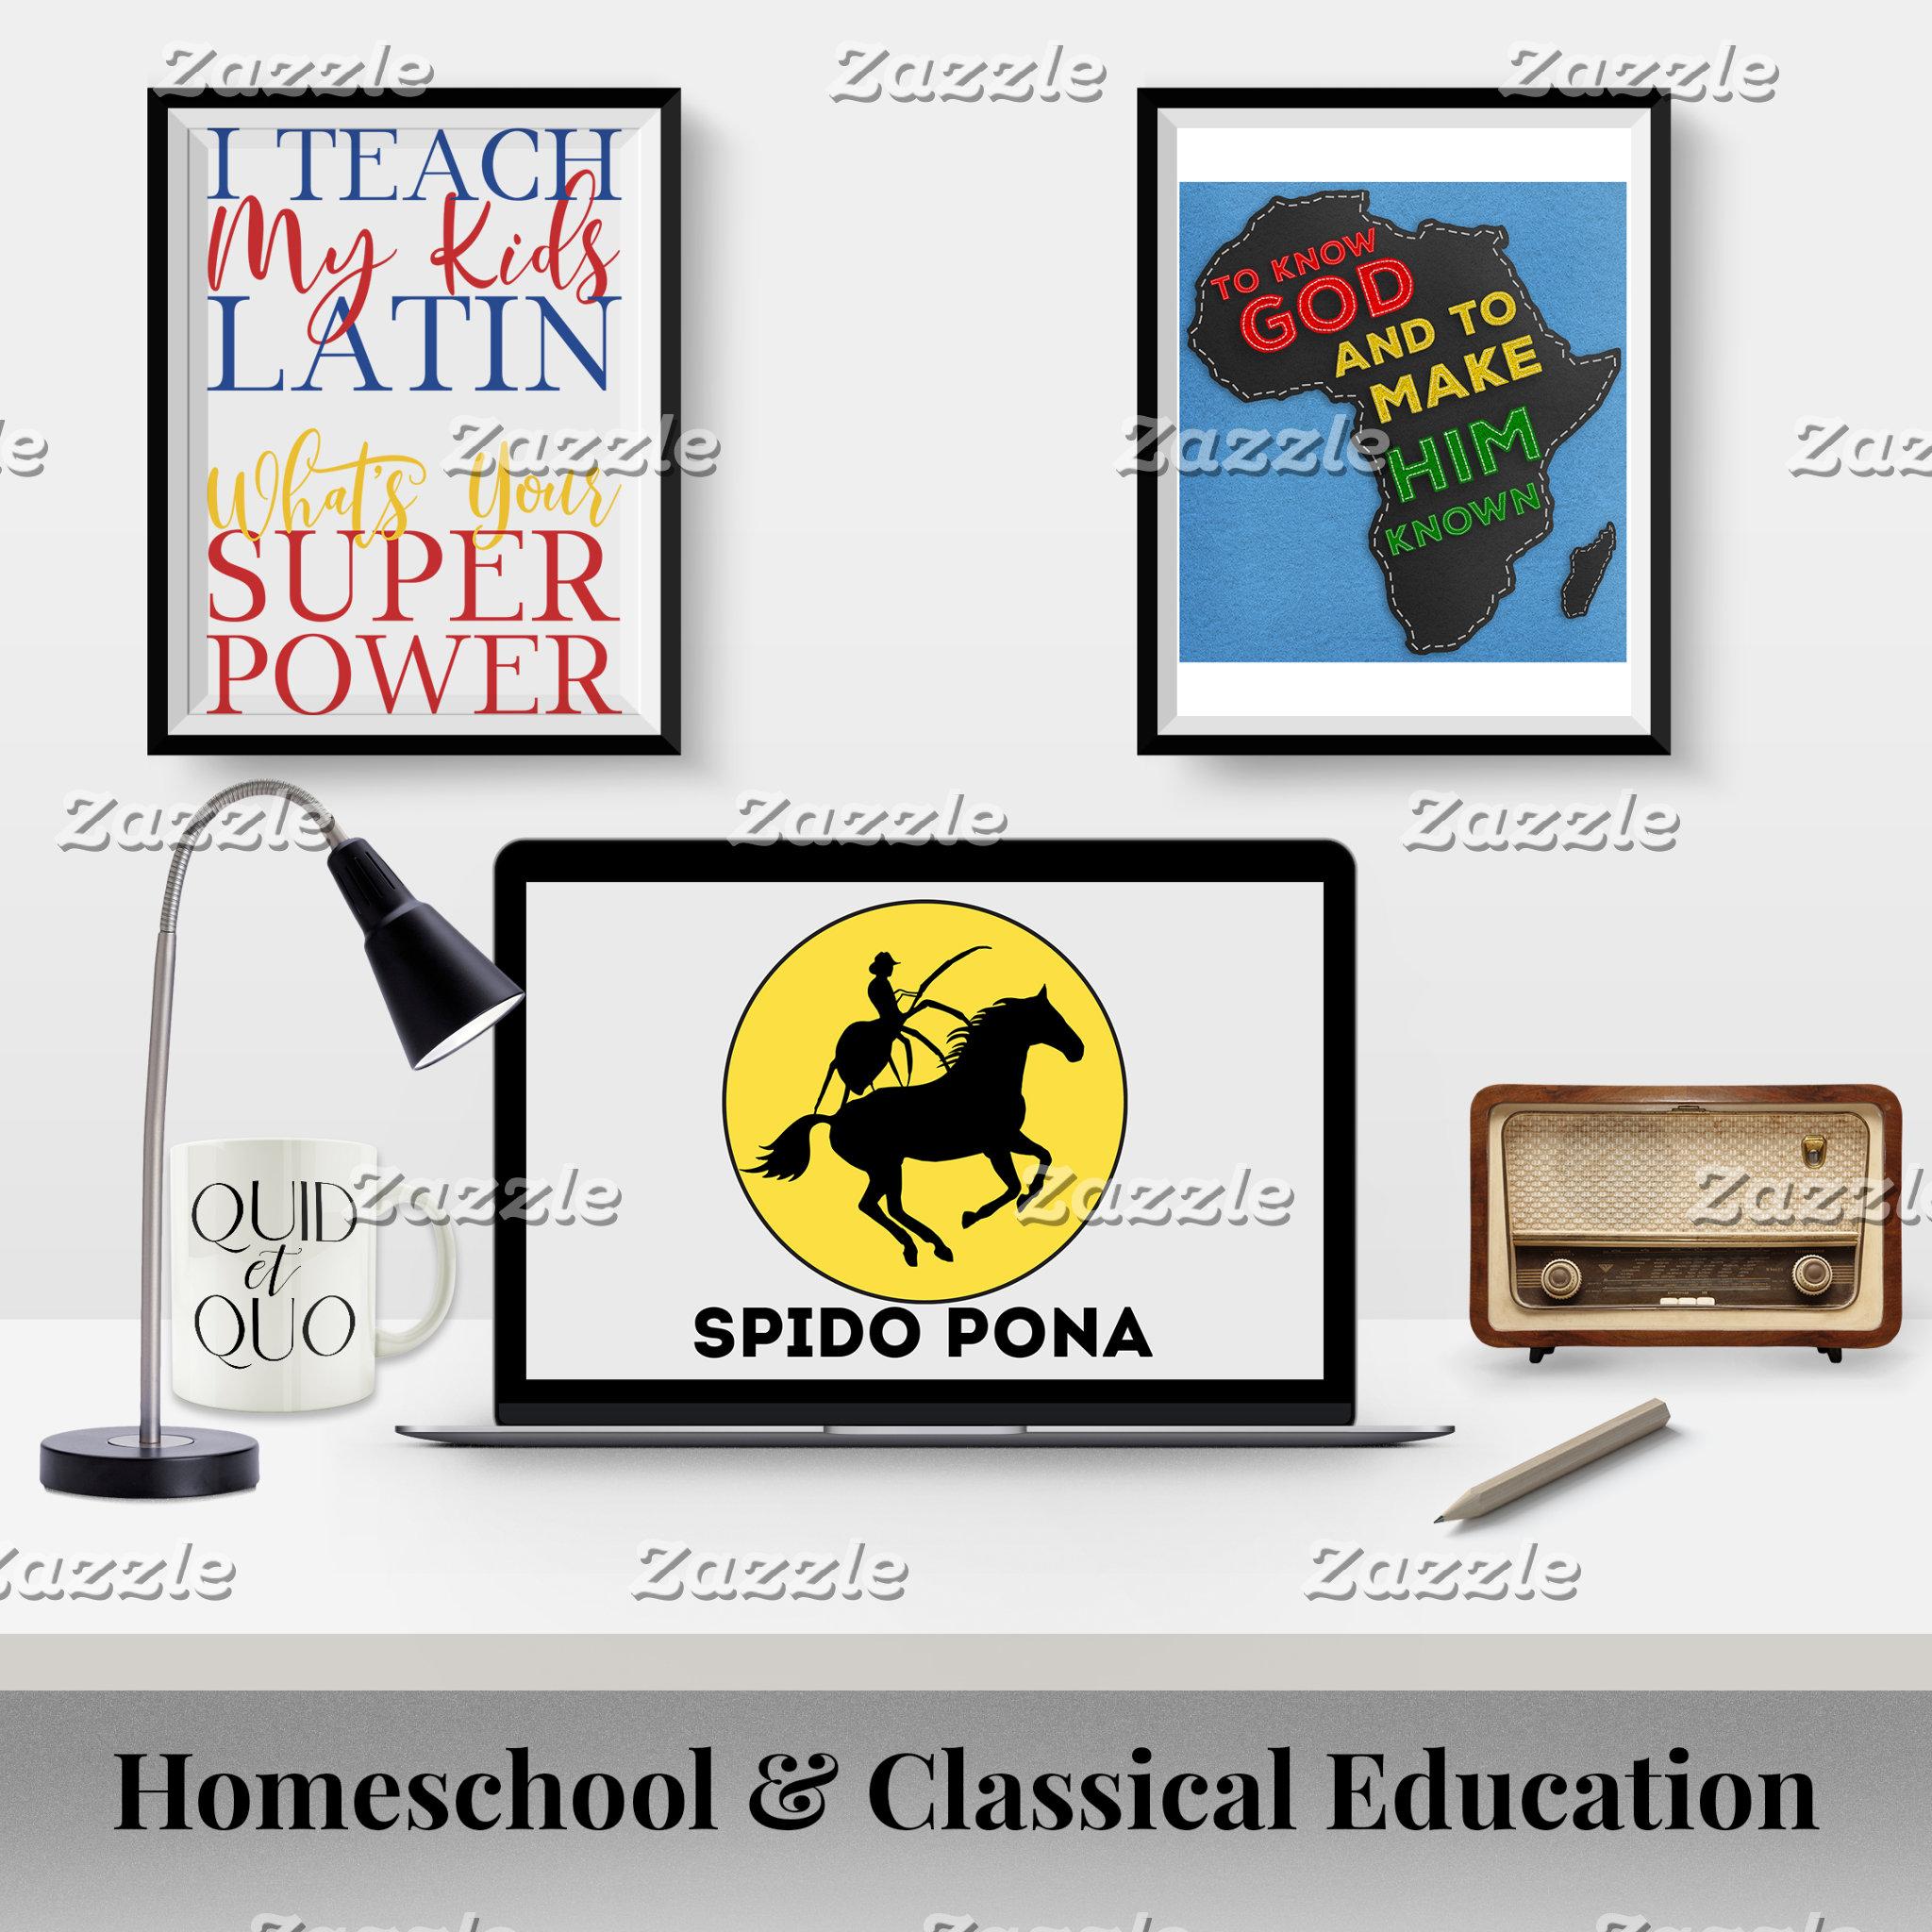 Homeschool & Classical Education